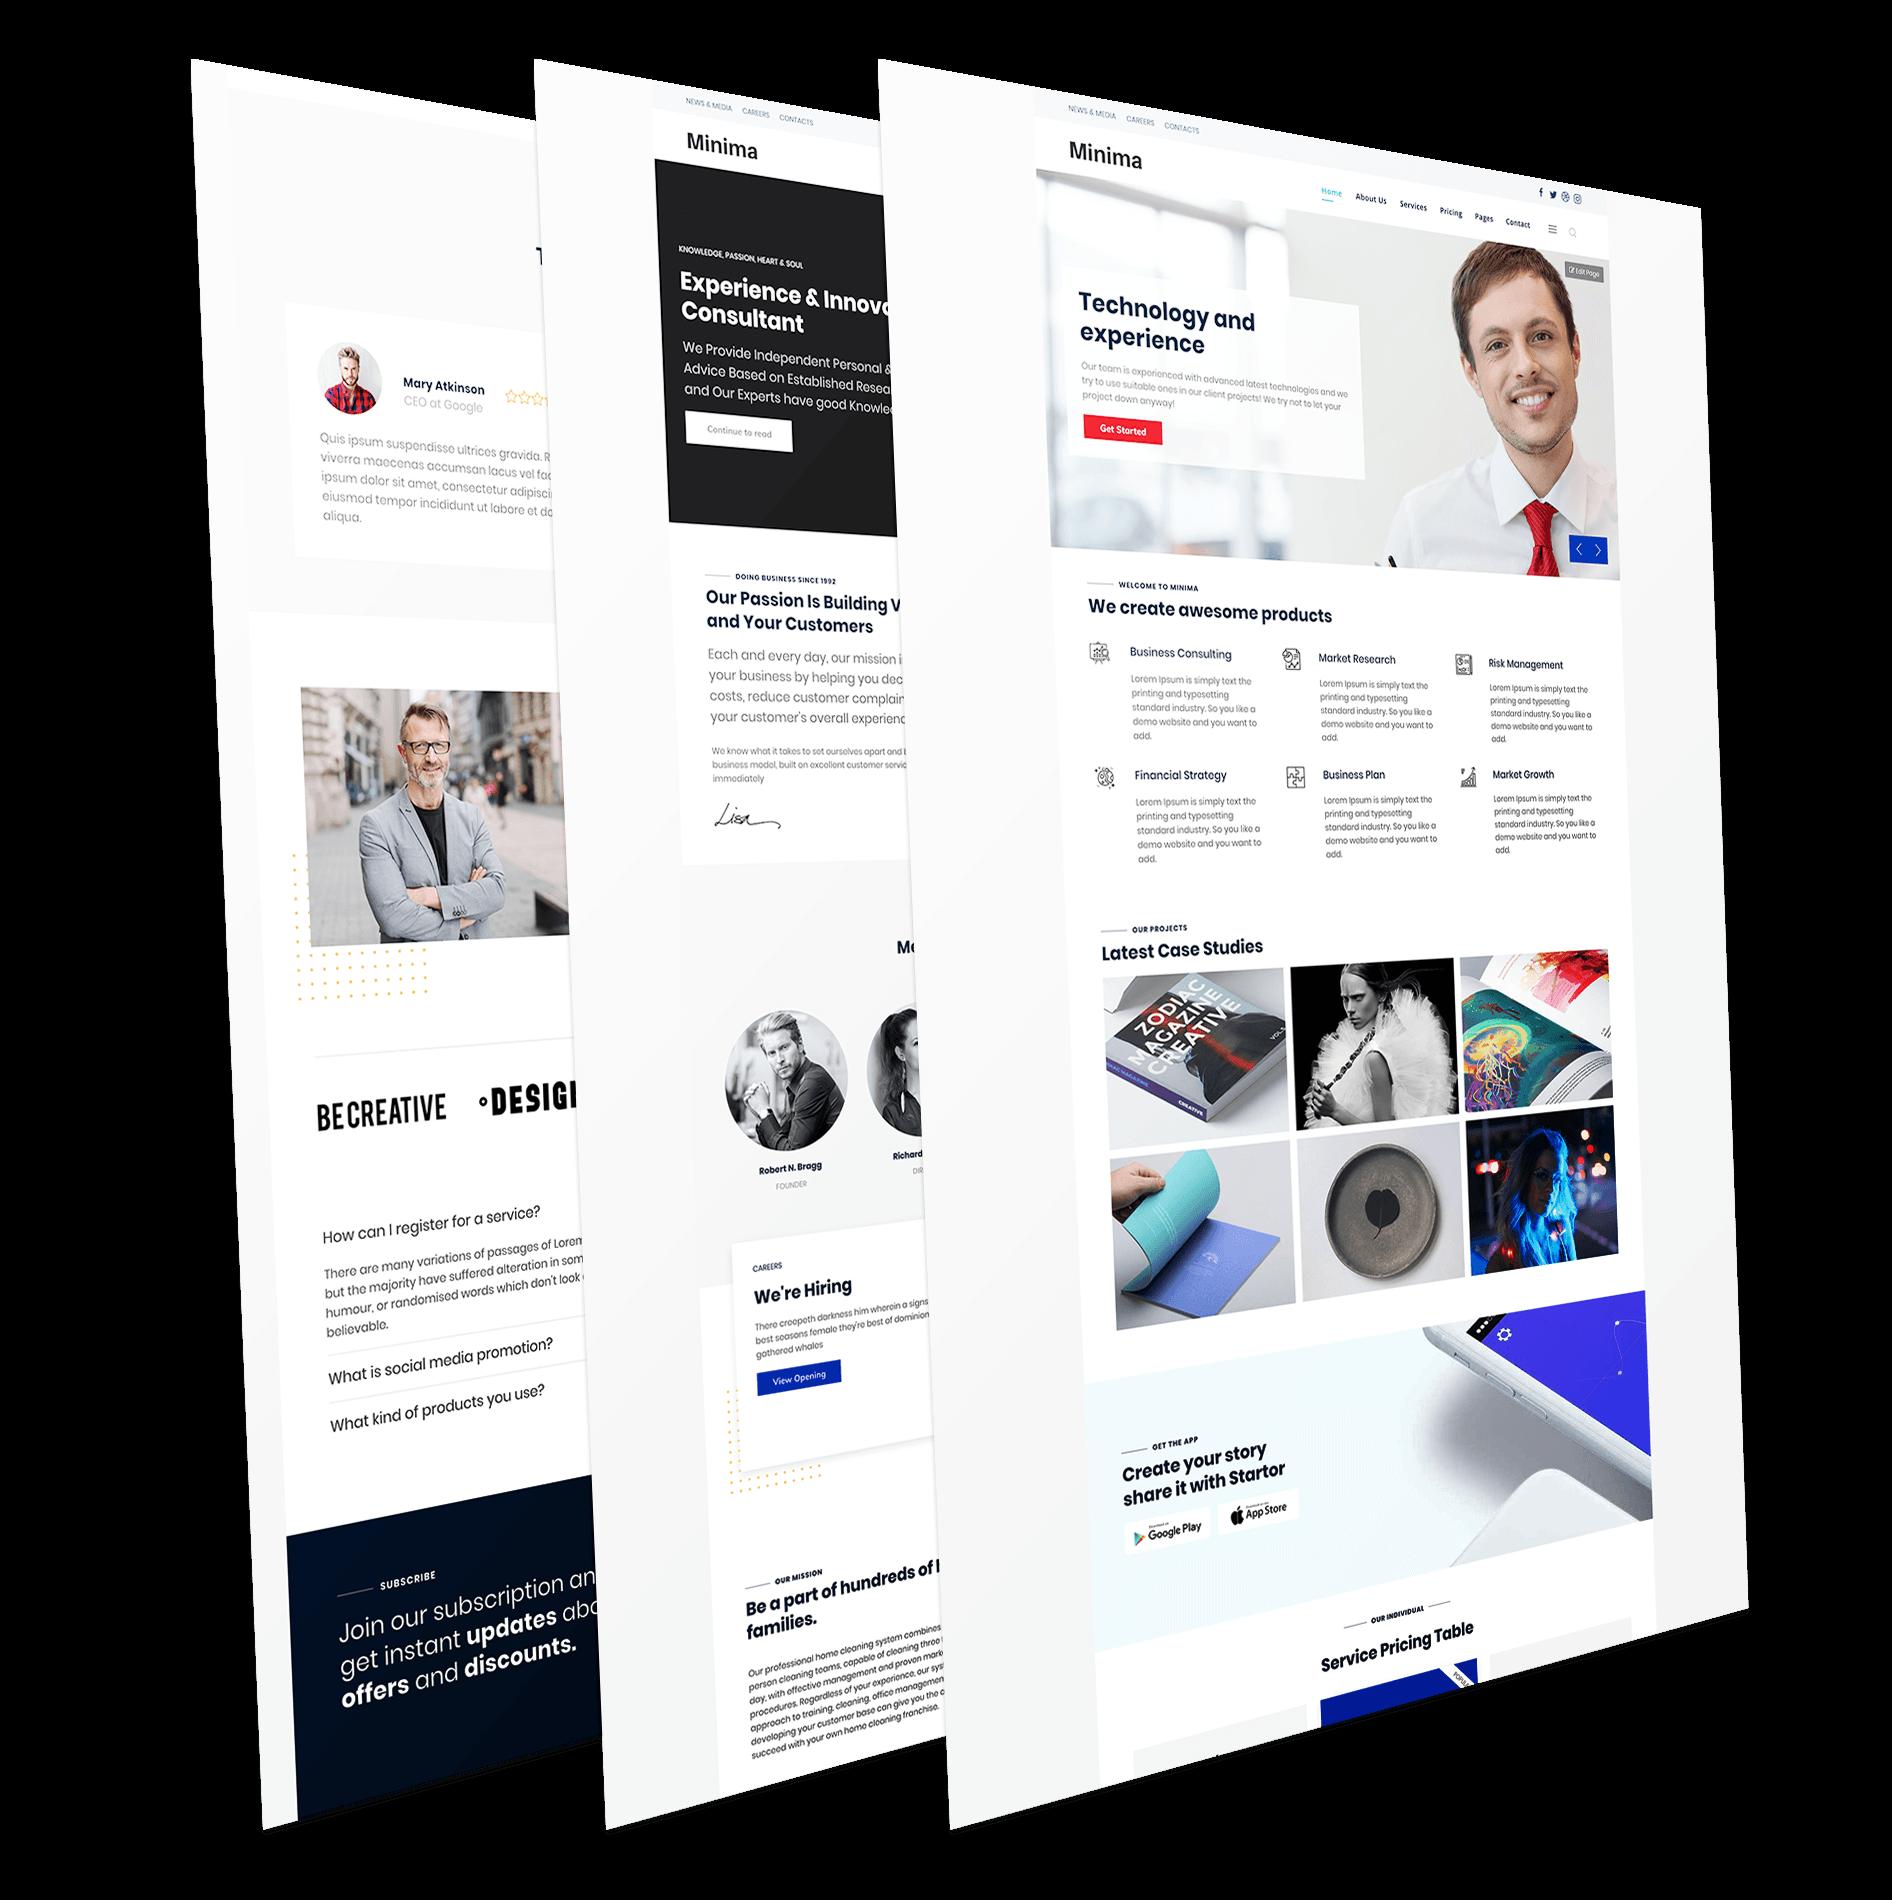 Minima - Responsive joomla template for business